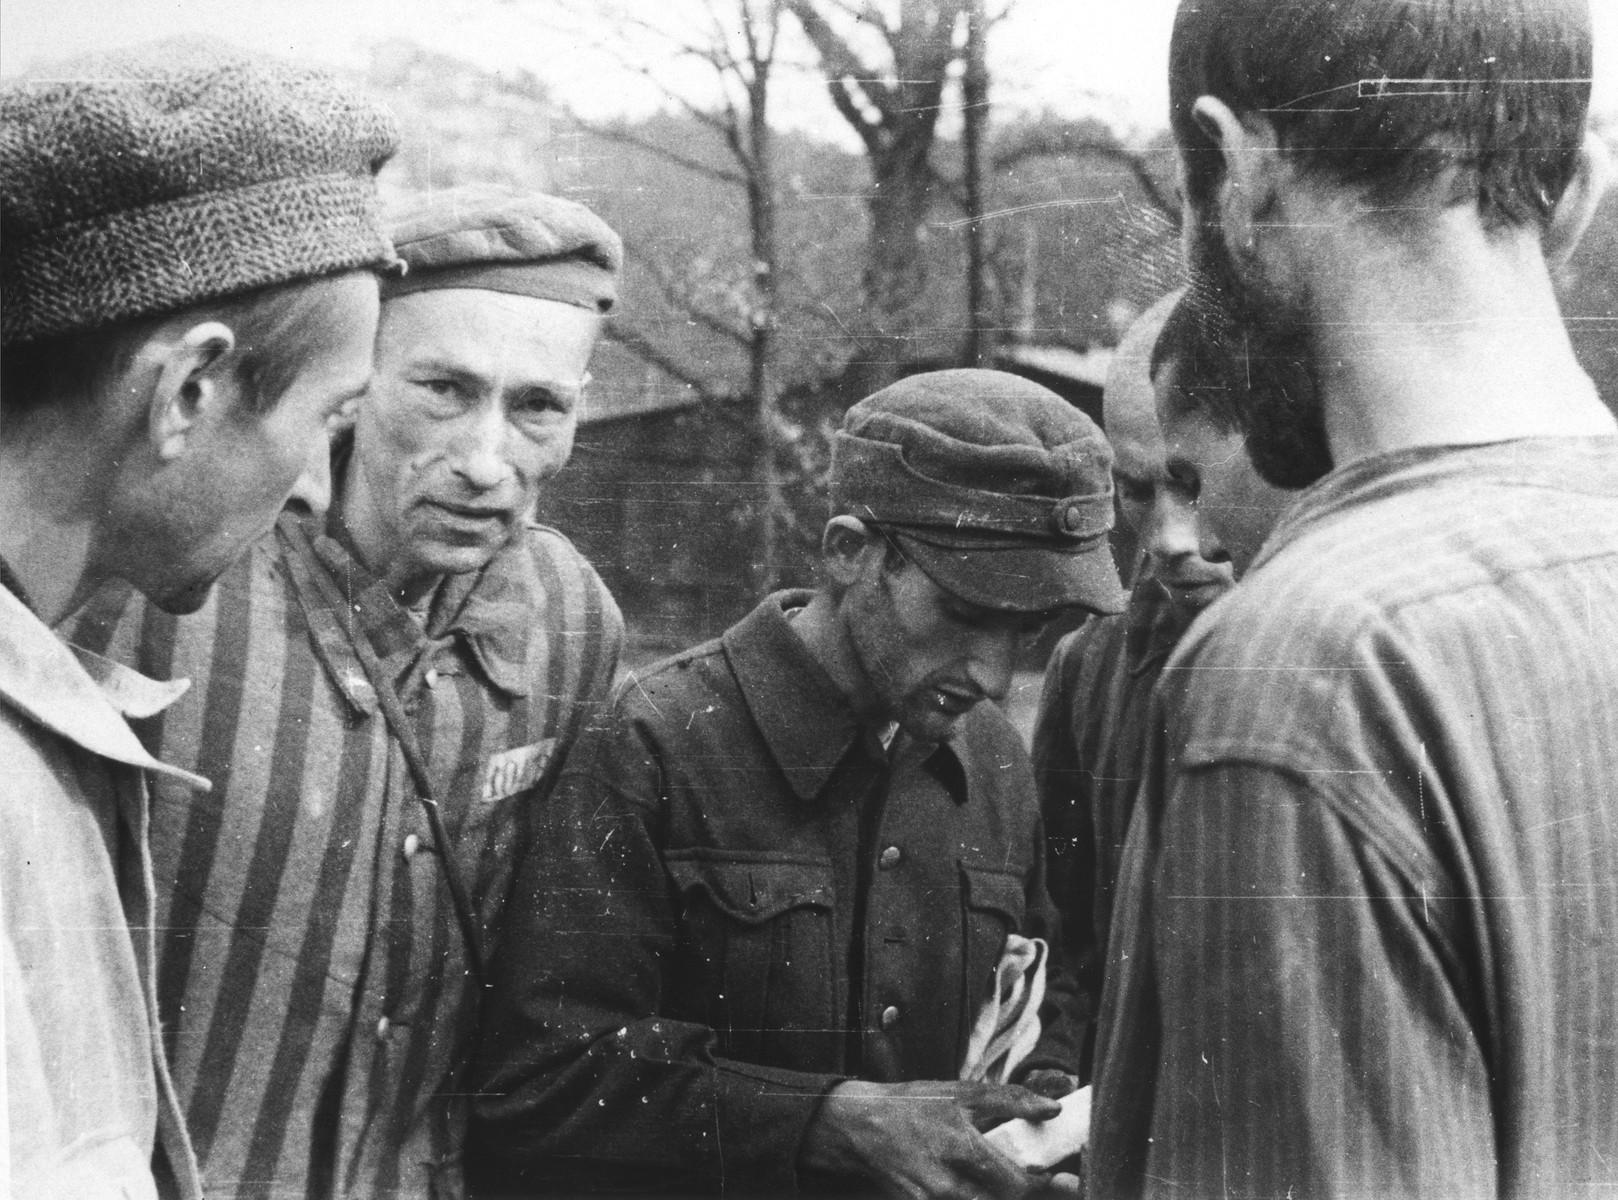 Survivors in an unidentified camp Langenstein-Zwieberge, a sub-camp of Buchenwald, soon after liberation.